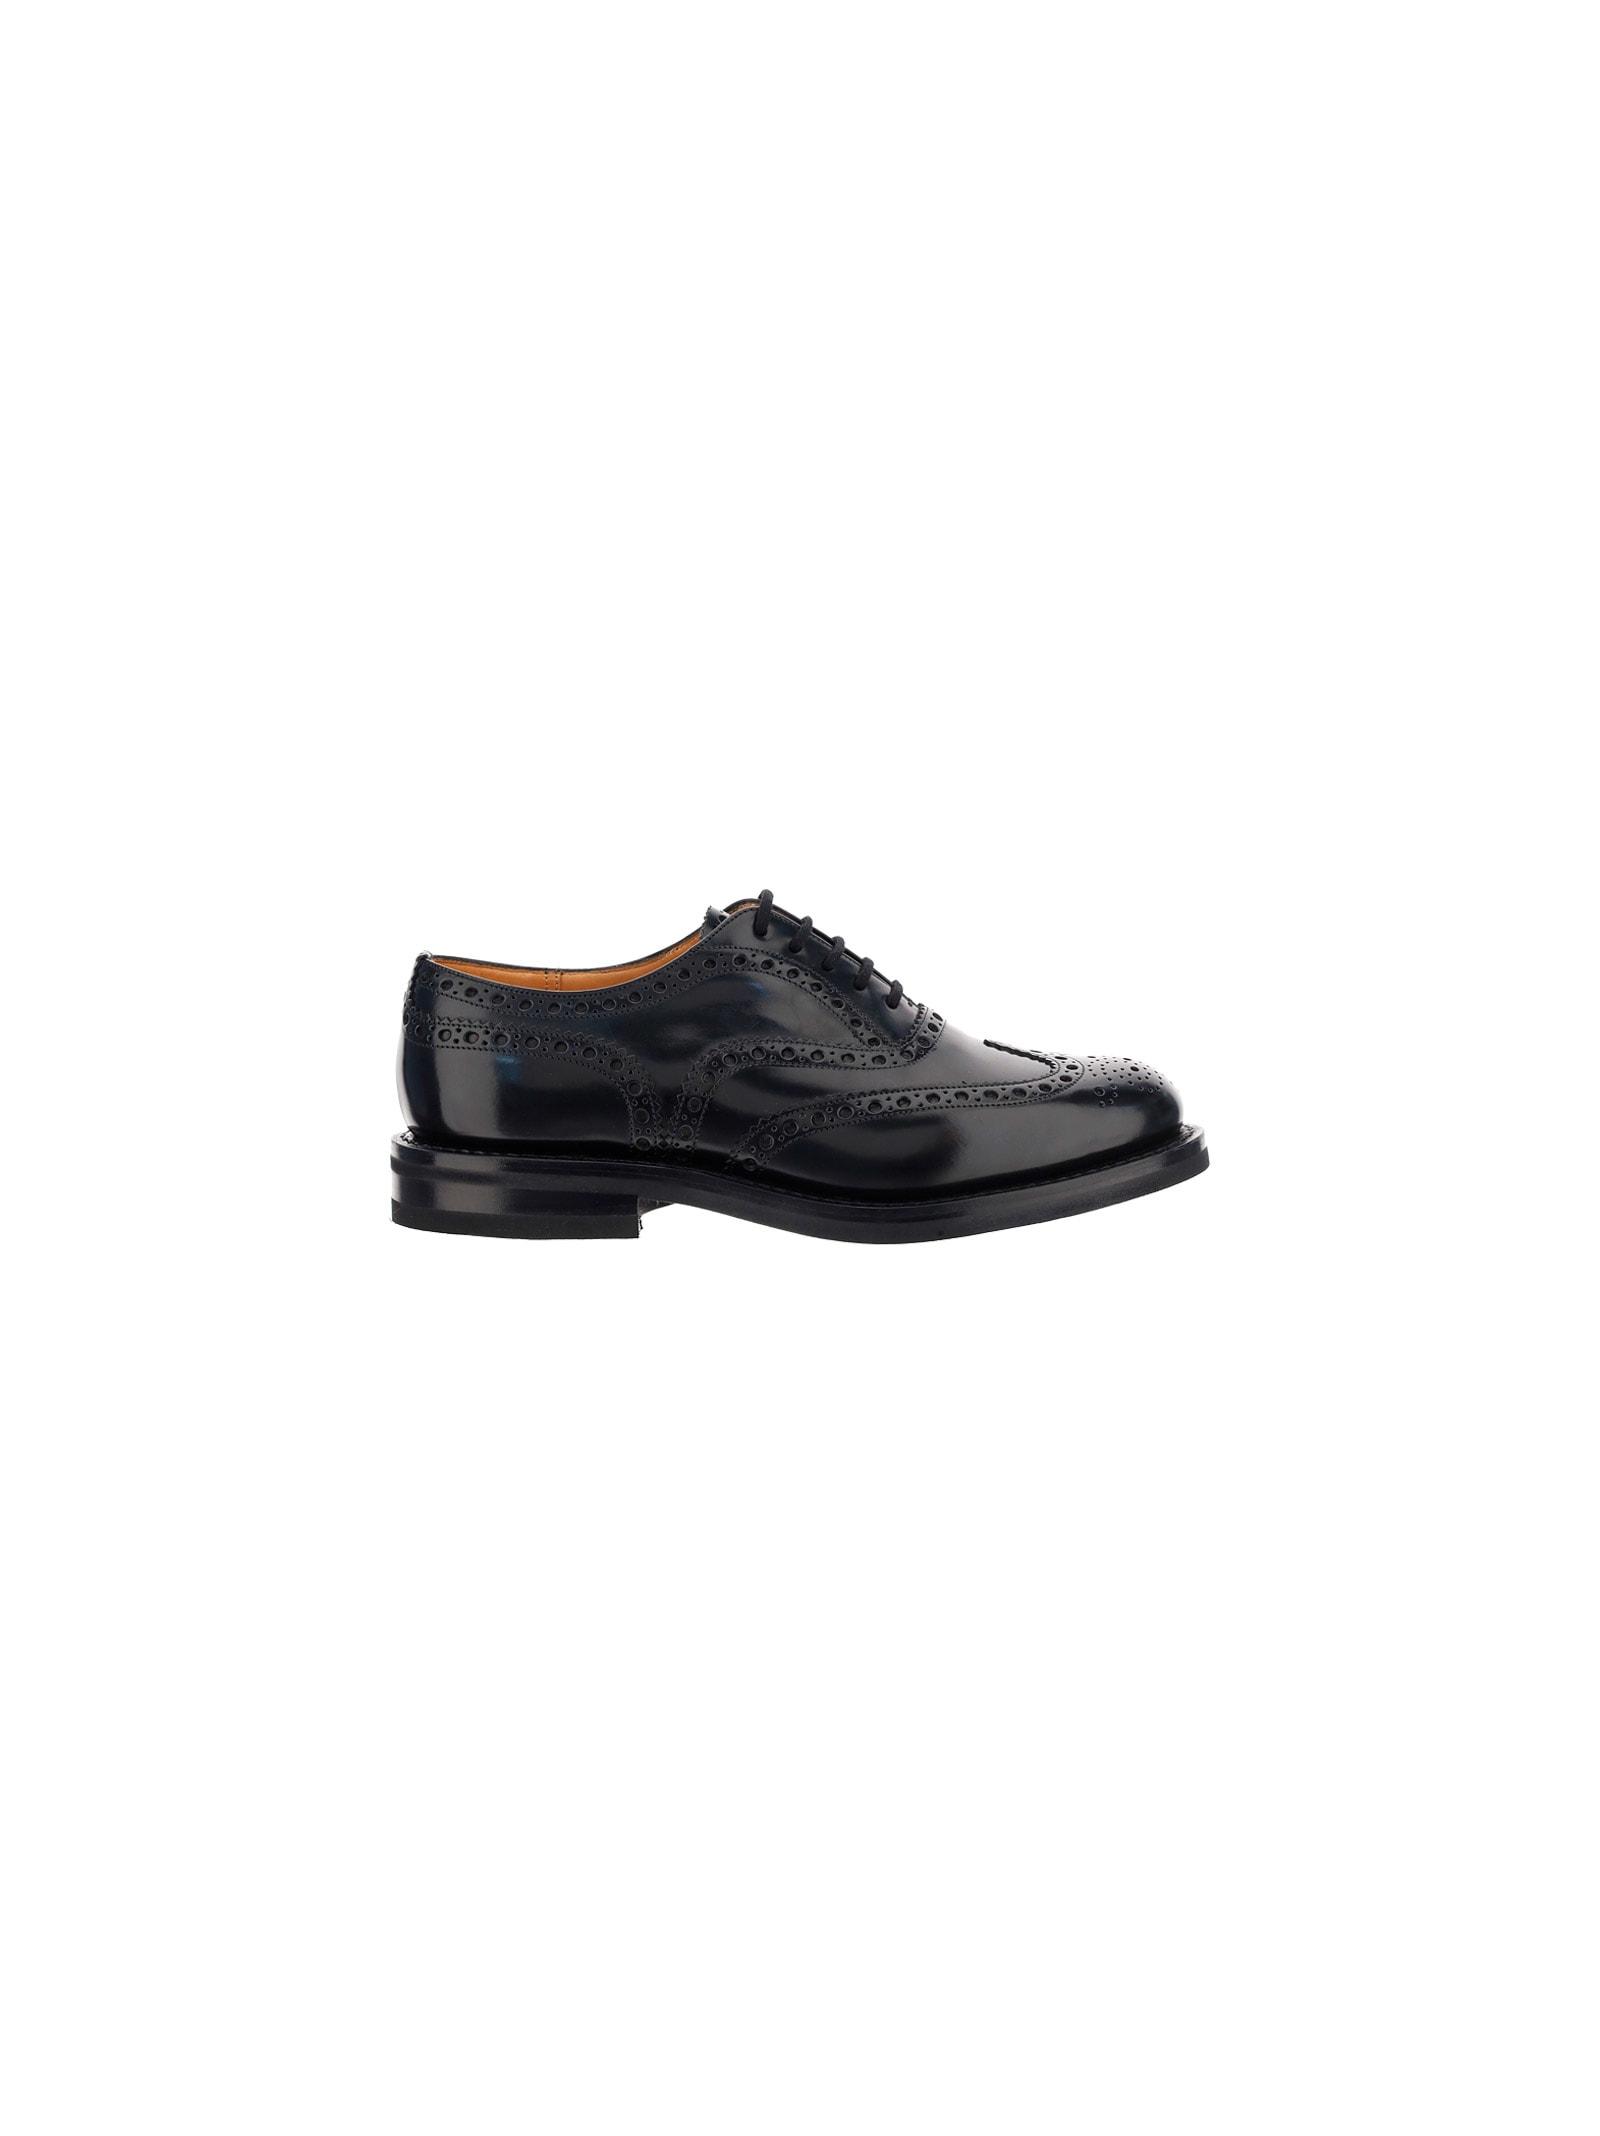 Churchs Burwood Lace Up Shoes